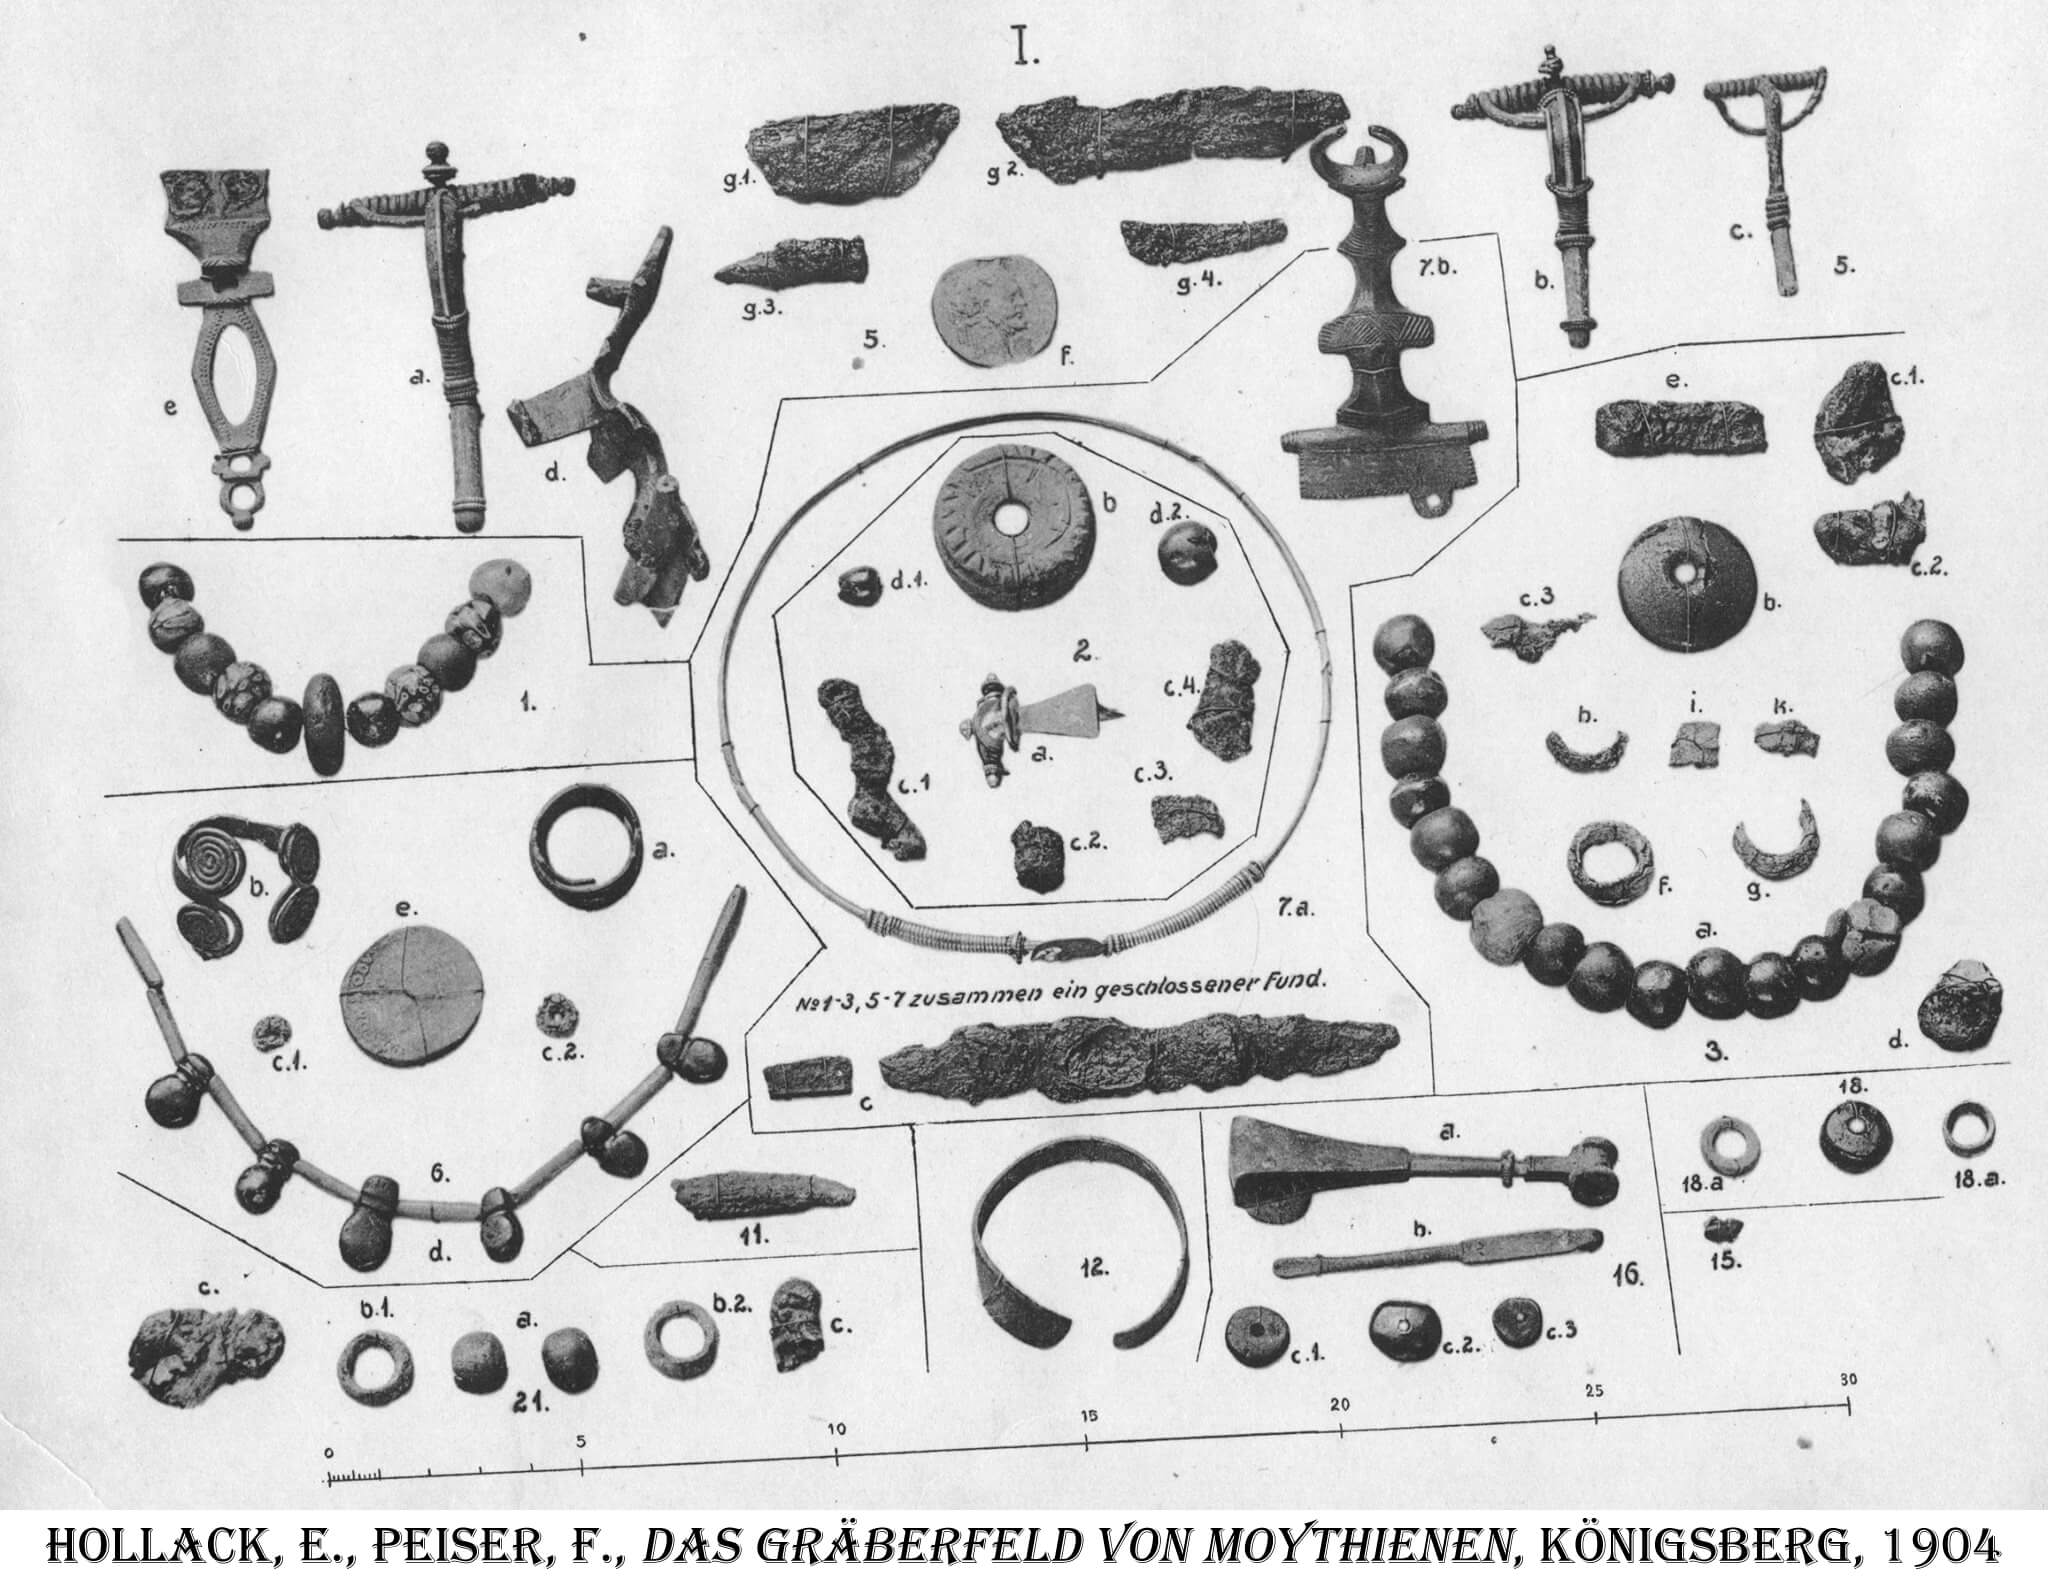 Tablica zabytków Mojtyny 2